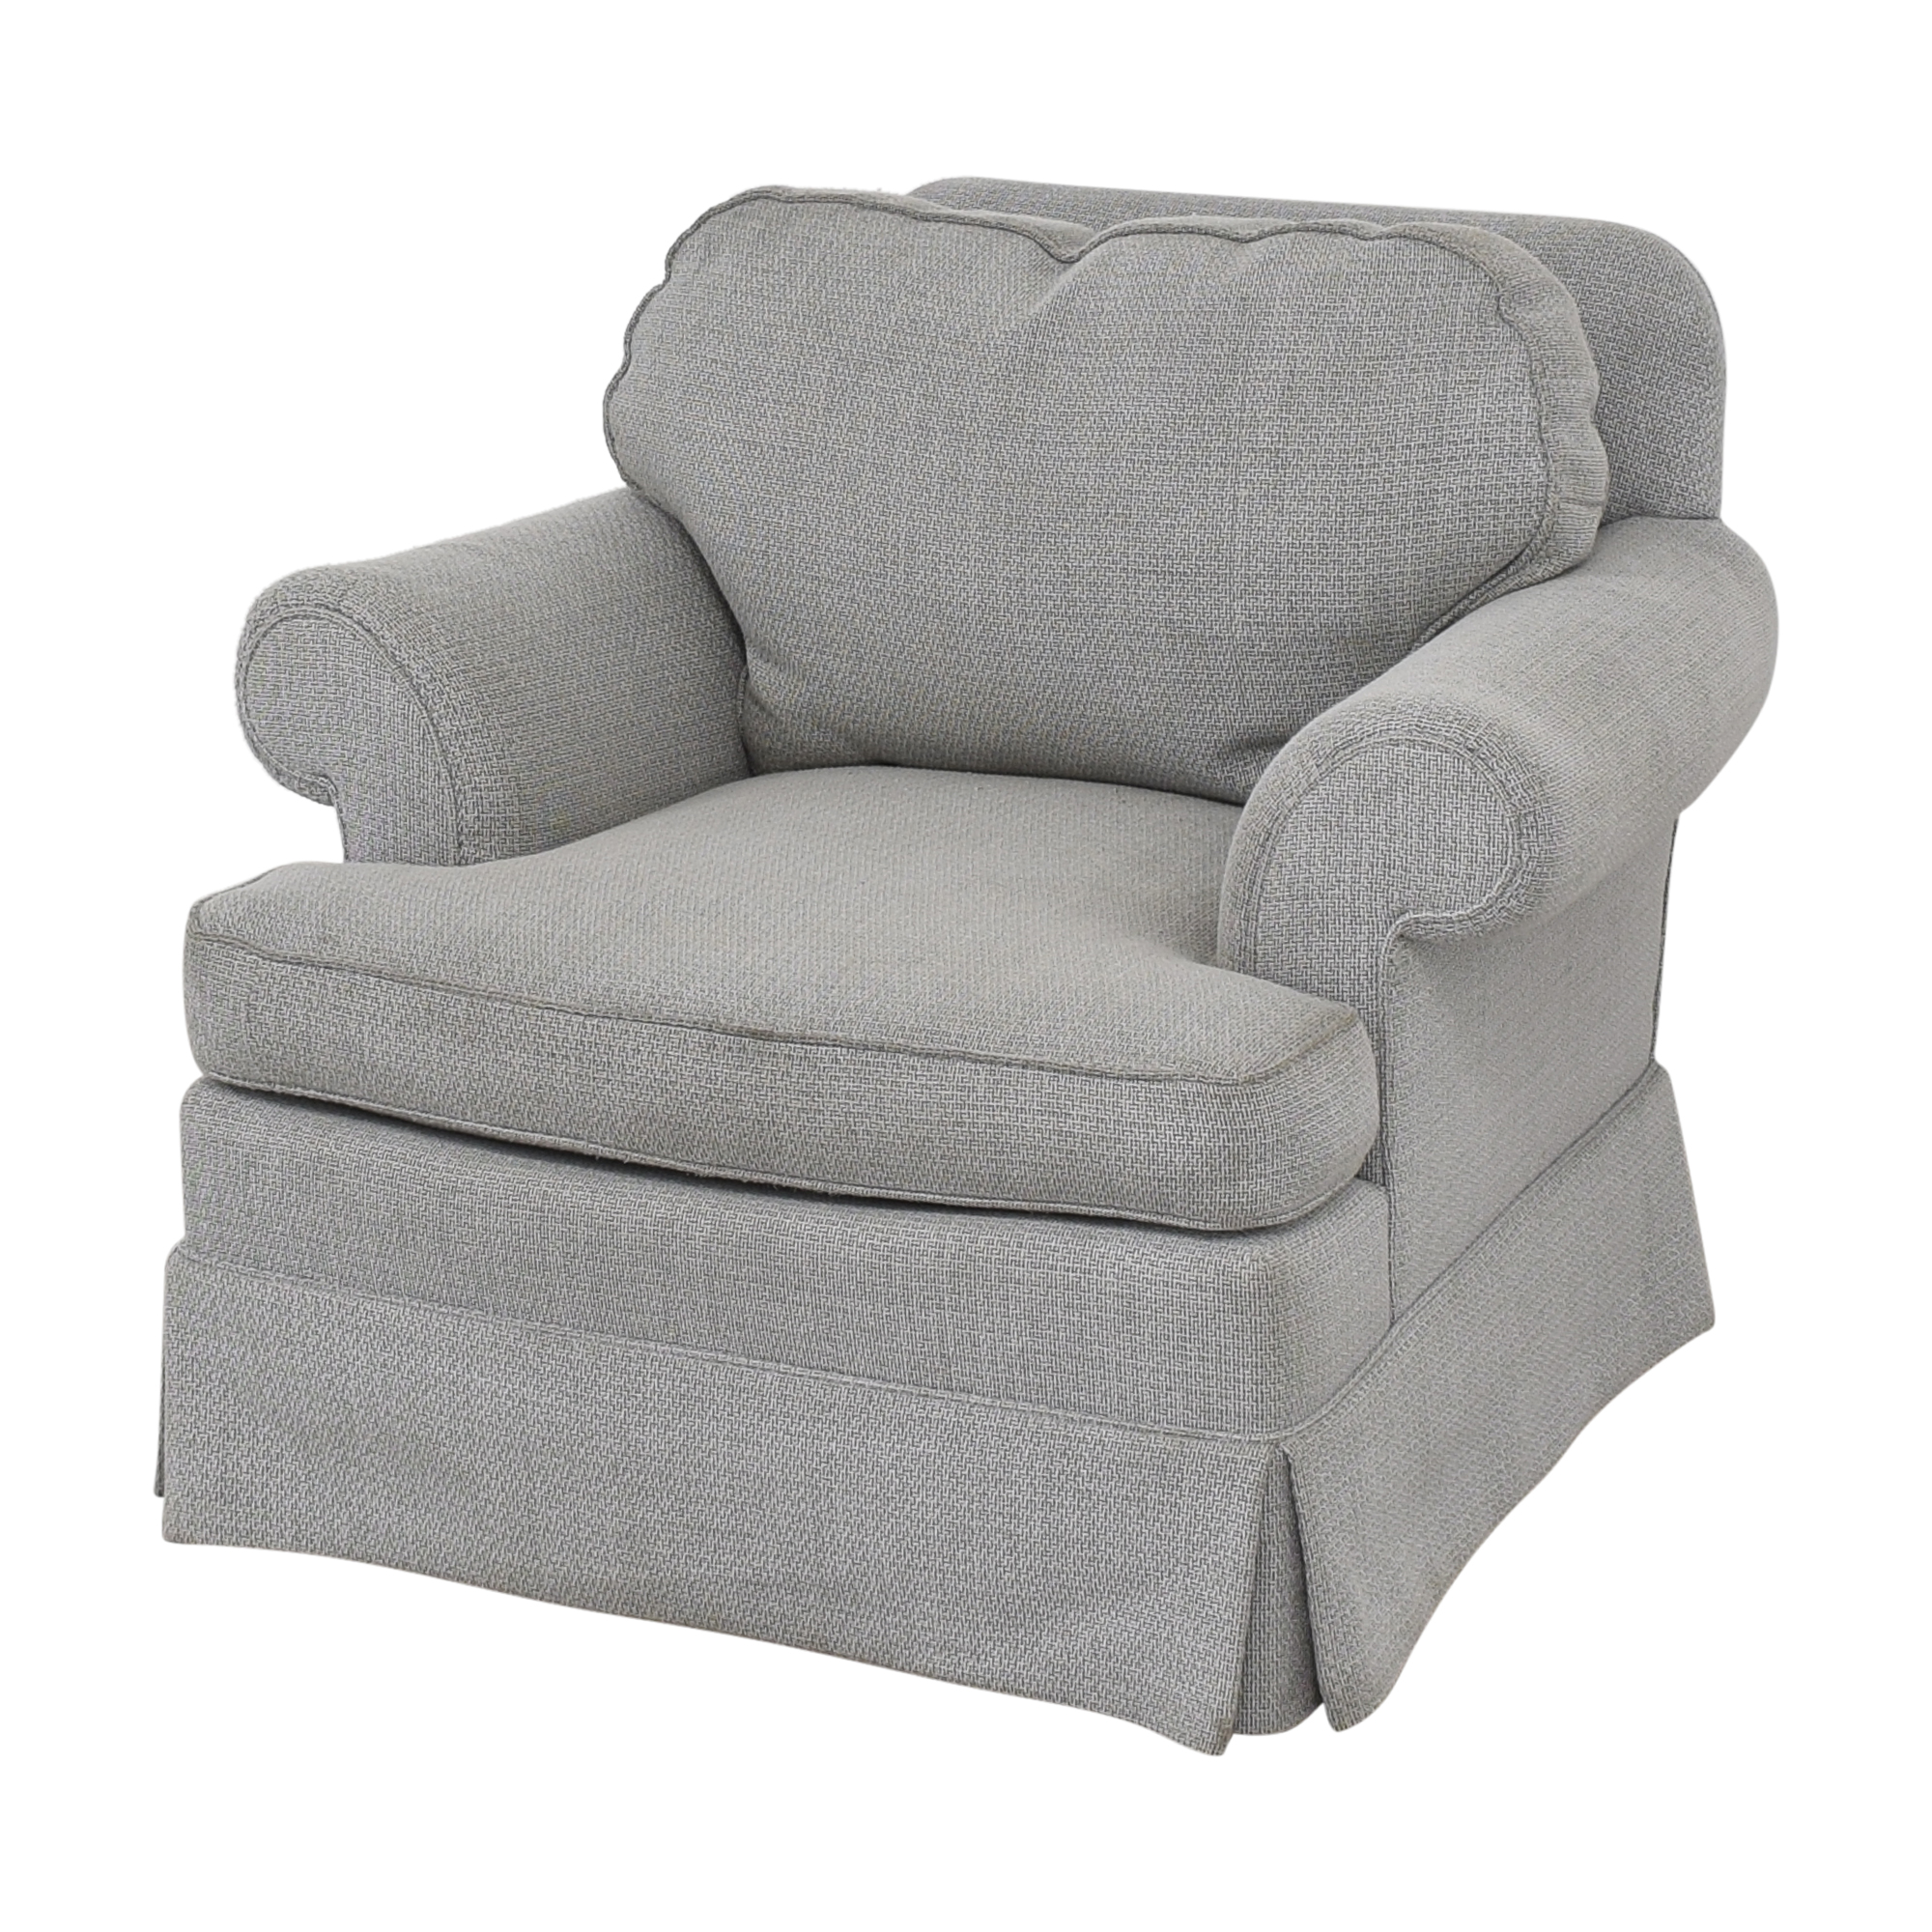 Custom Slipcovered Armchair / Chairs